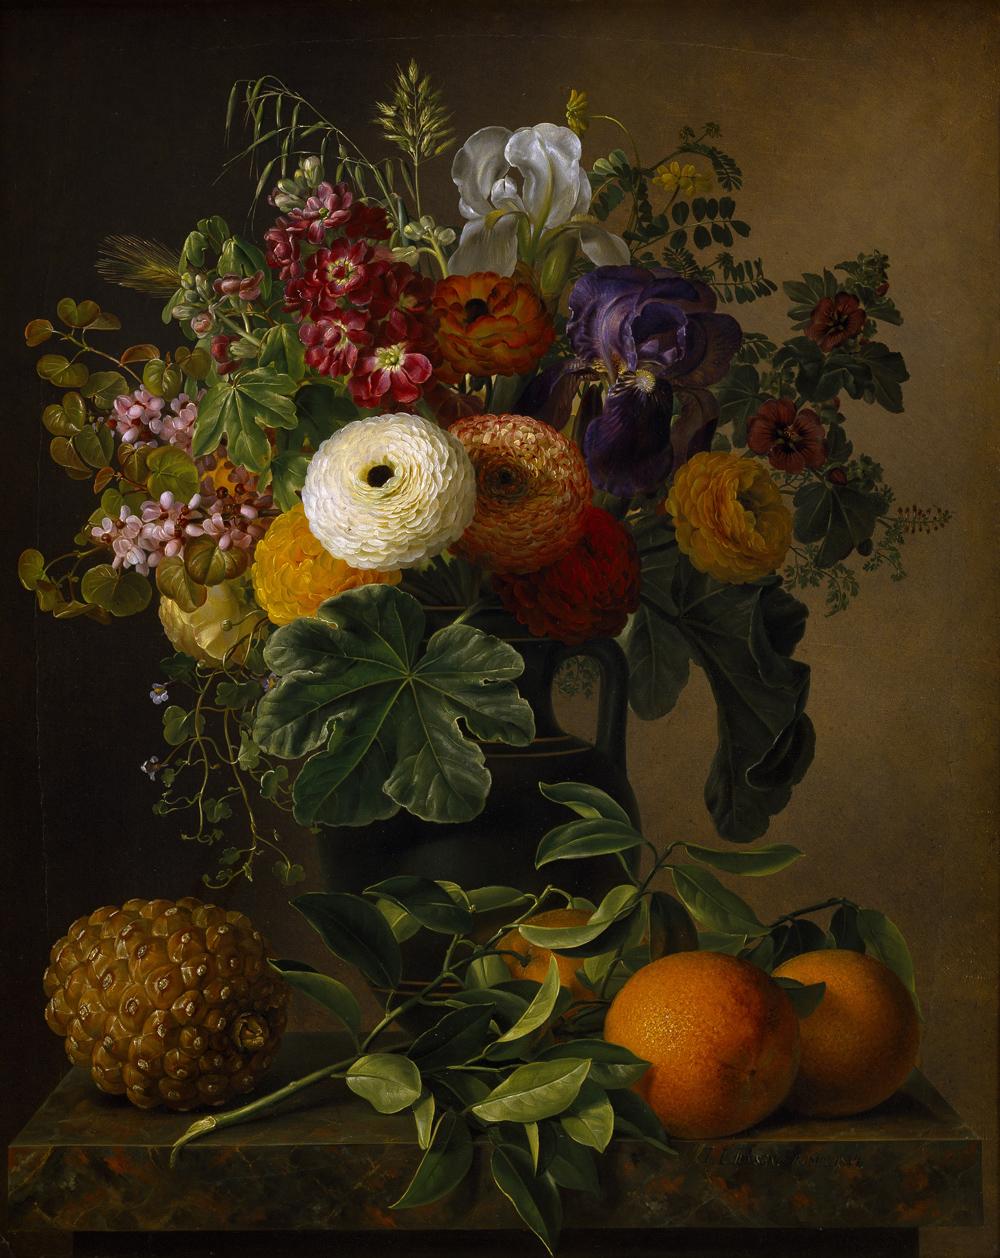 J.L._Jensen_Nature_morte_med_blomster_i_antik_vase_pa_en_marmorbordplade_1834_B232_Thorvaldsens_Museum.jpg